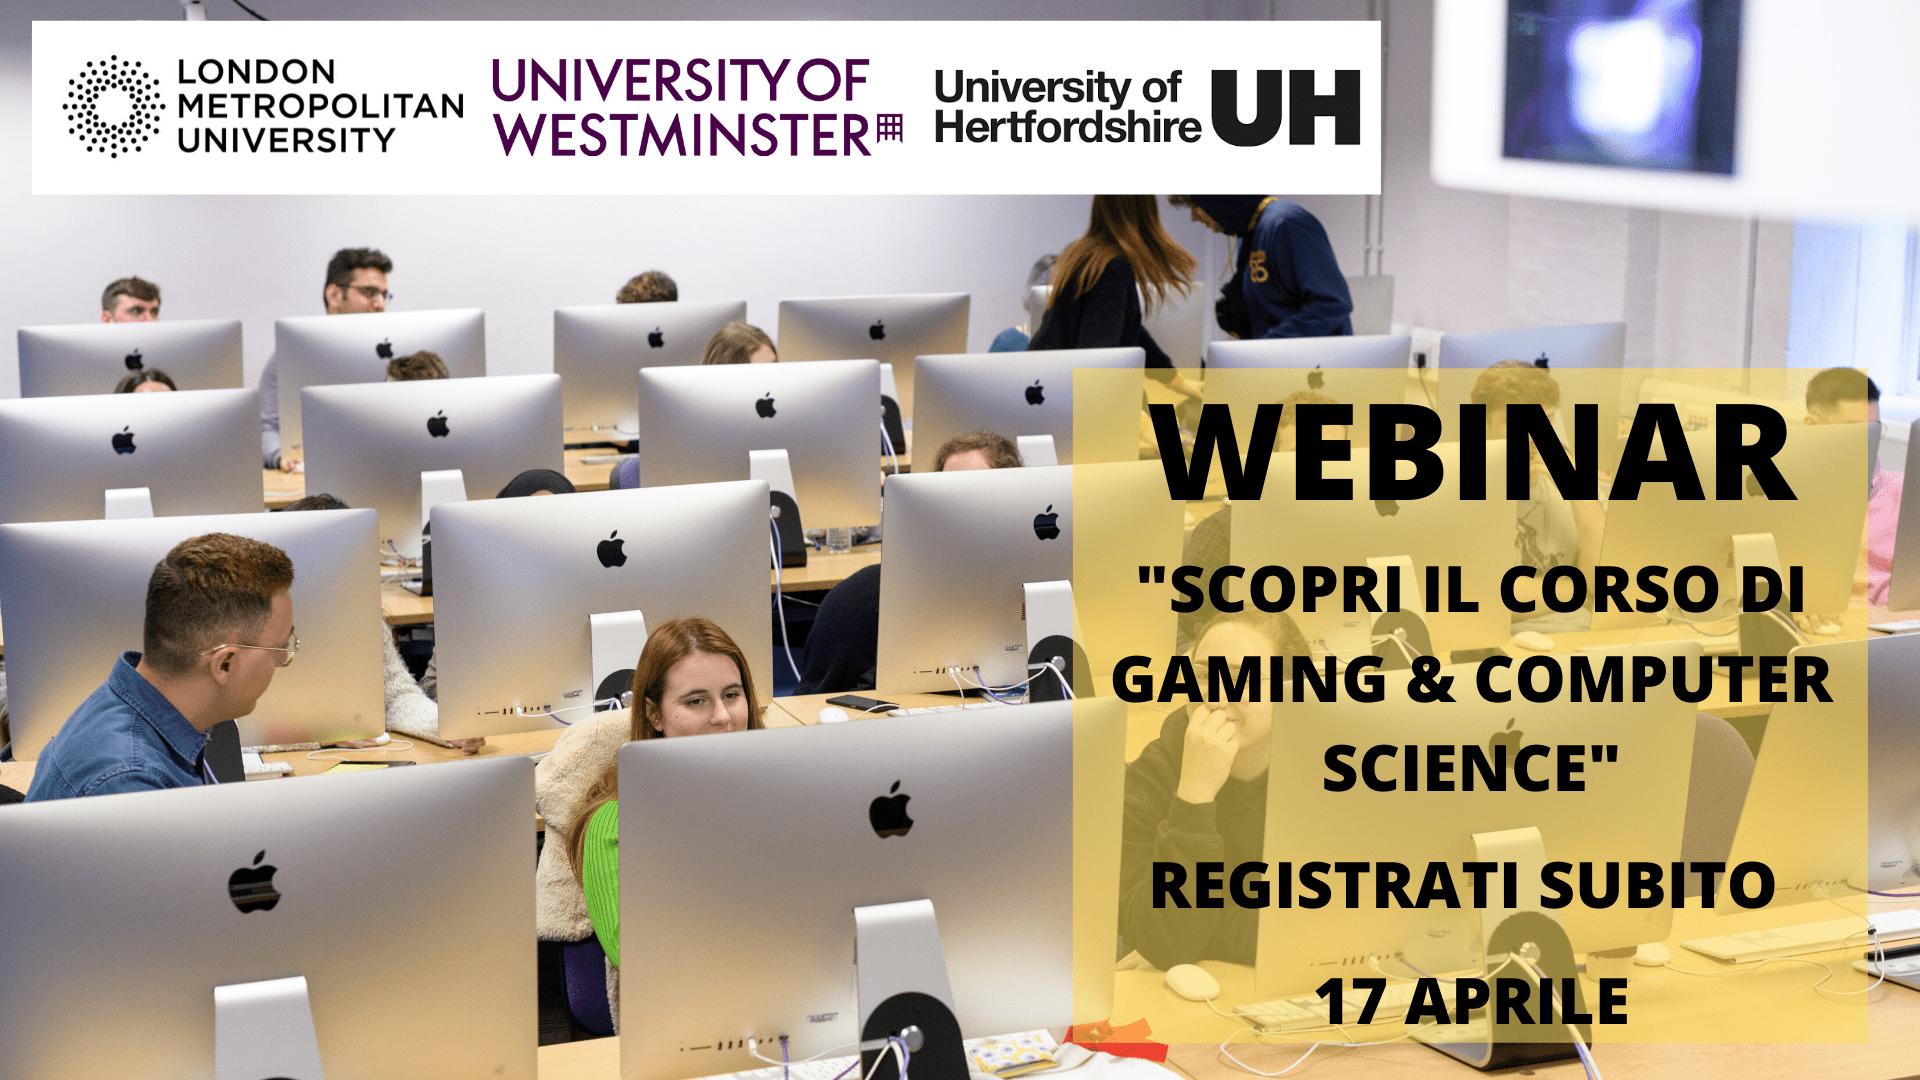 Scopri Gaming e Computer Science. Studenti in aula. Registrati il 17 aprile, London Metropolitan University, University of Westminster, Hertfordshire University